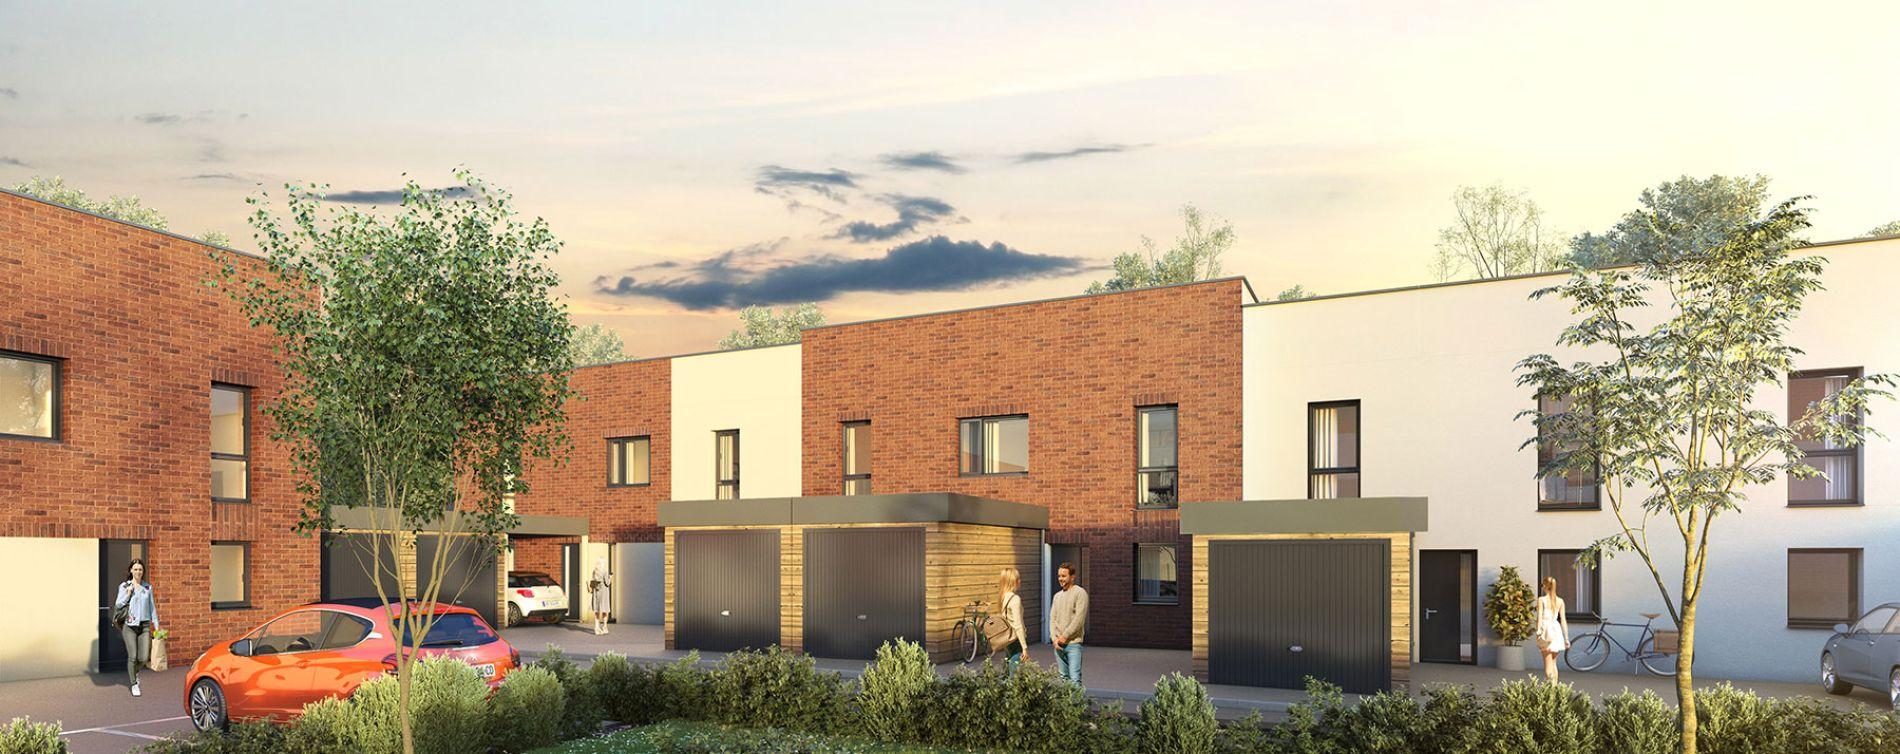 Tourcoing : programme immobilier neuve « Urban T - Maisons »